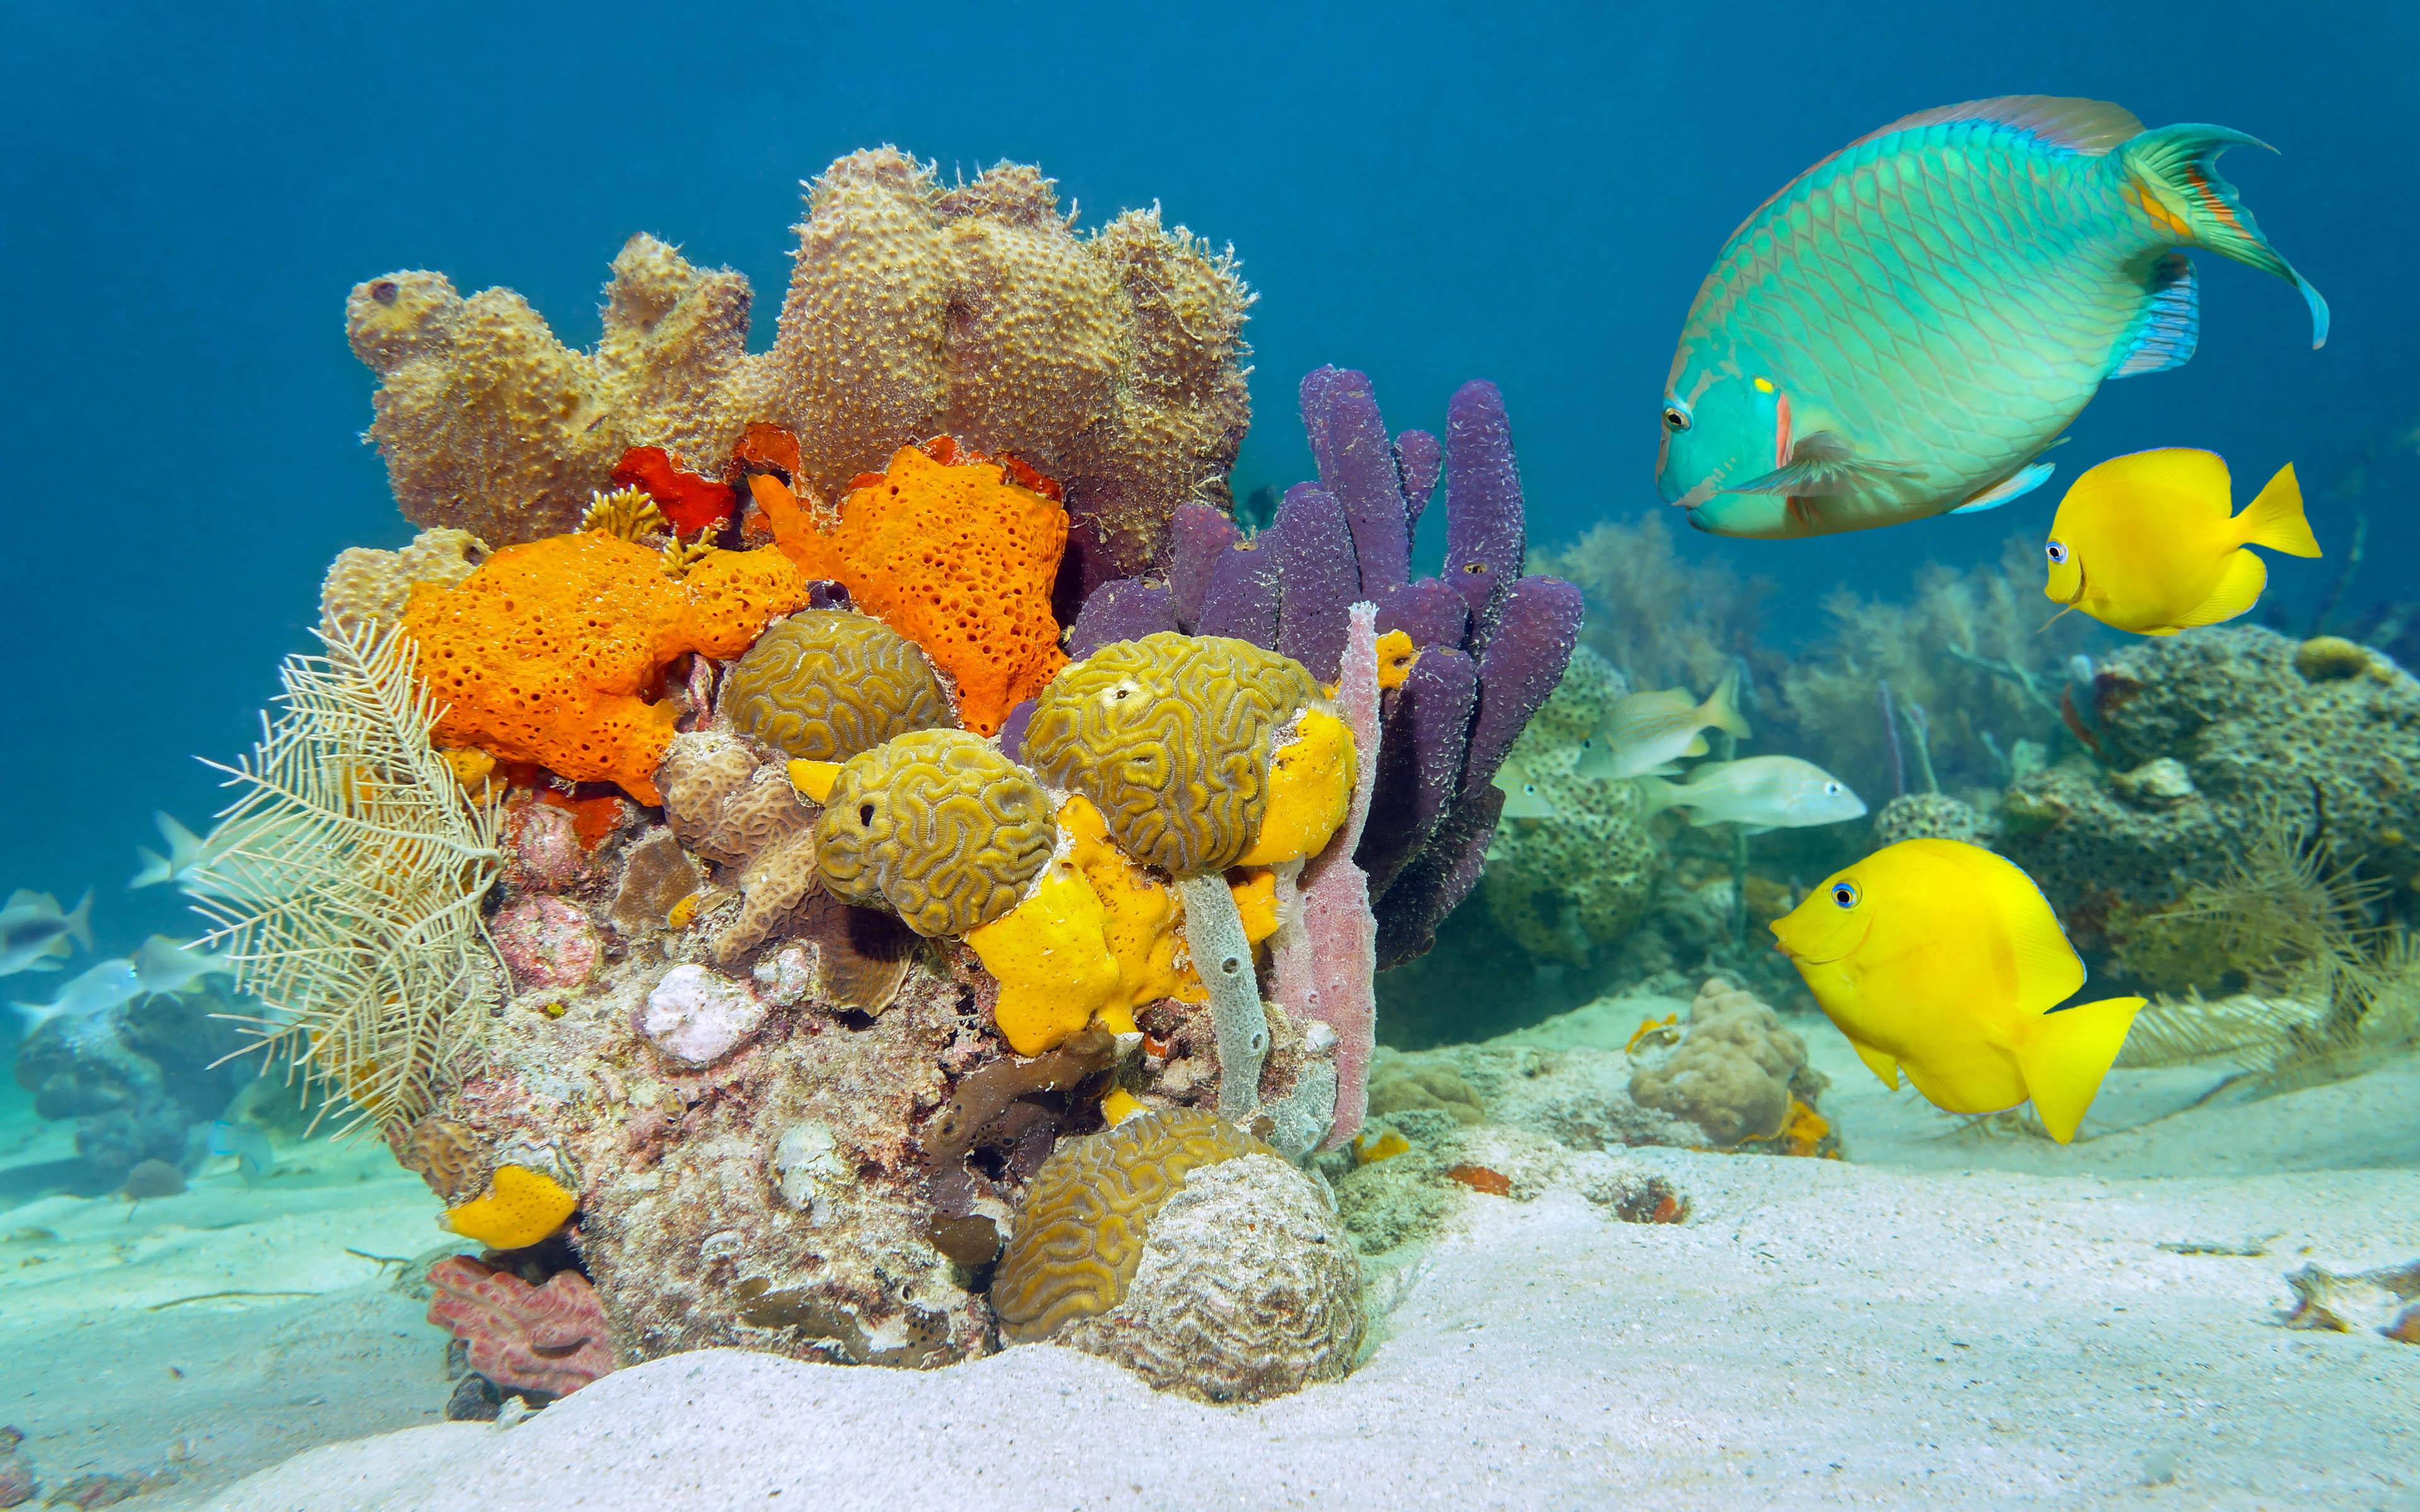 Aquarium Wallpapers 3d Free Download Underwater World Fish Desktop Wallpaper Hd Wallpapers13 Com